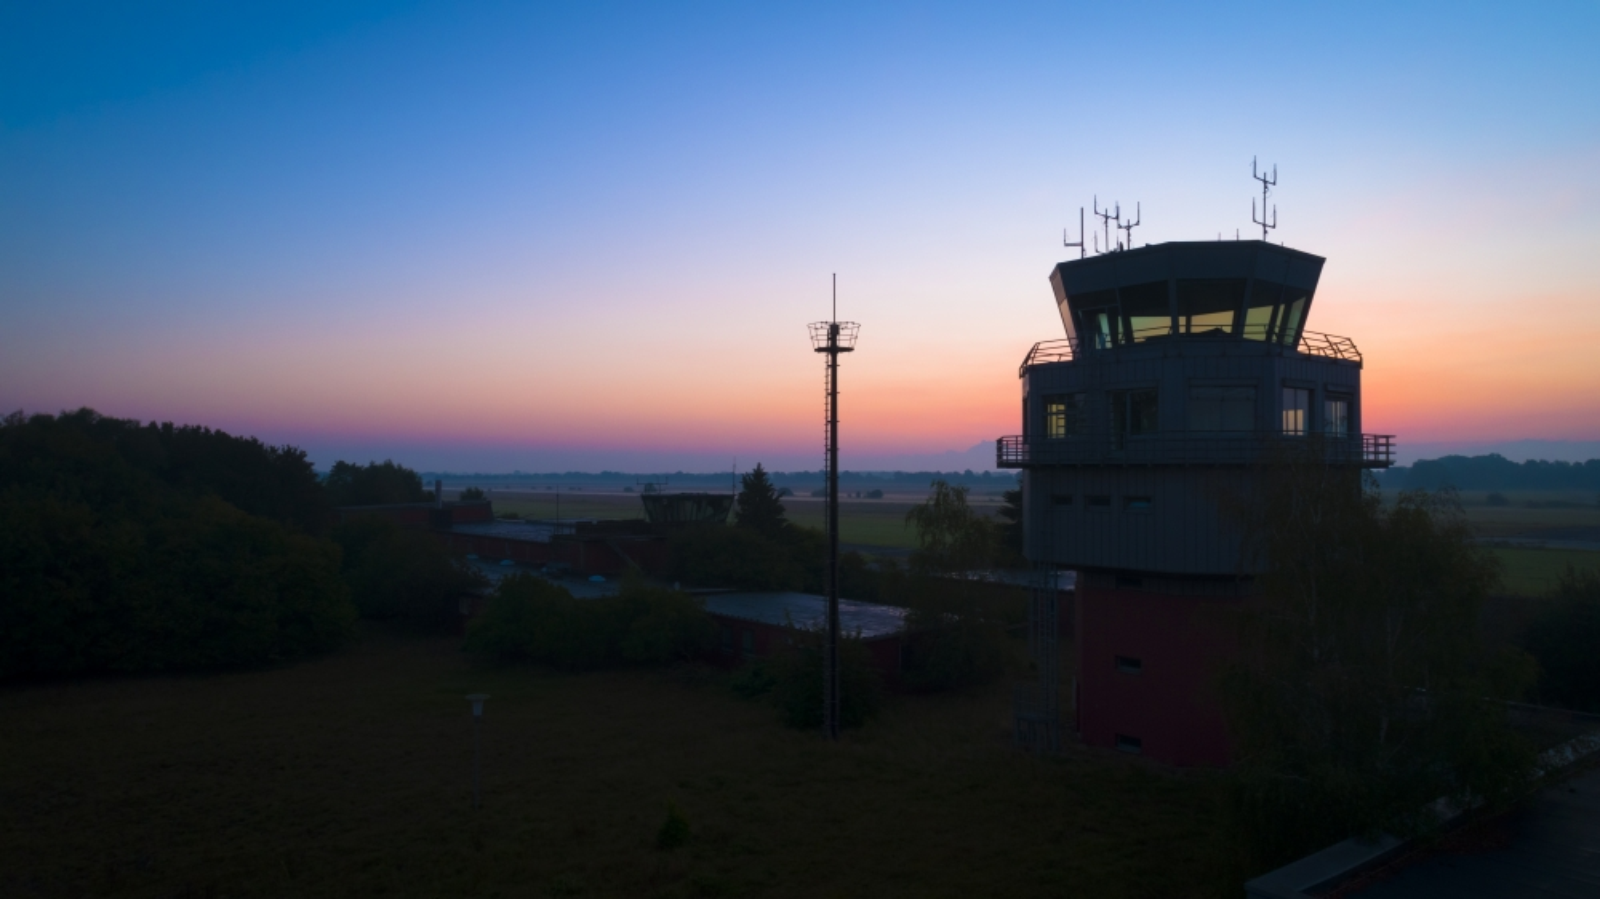 flugplatz-19-08-2020-004